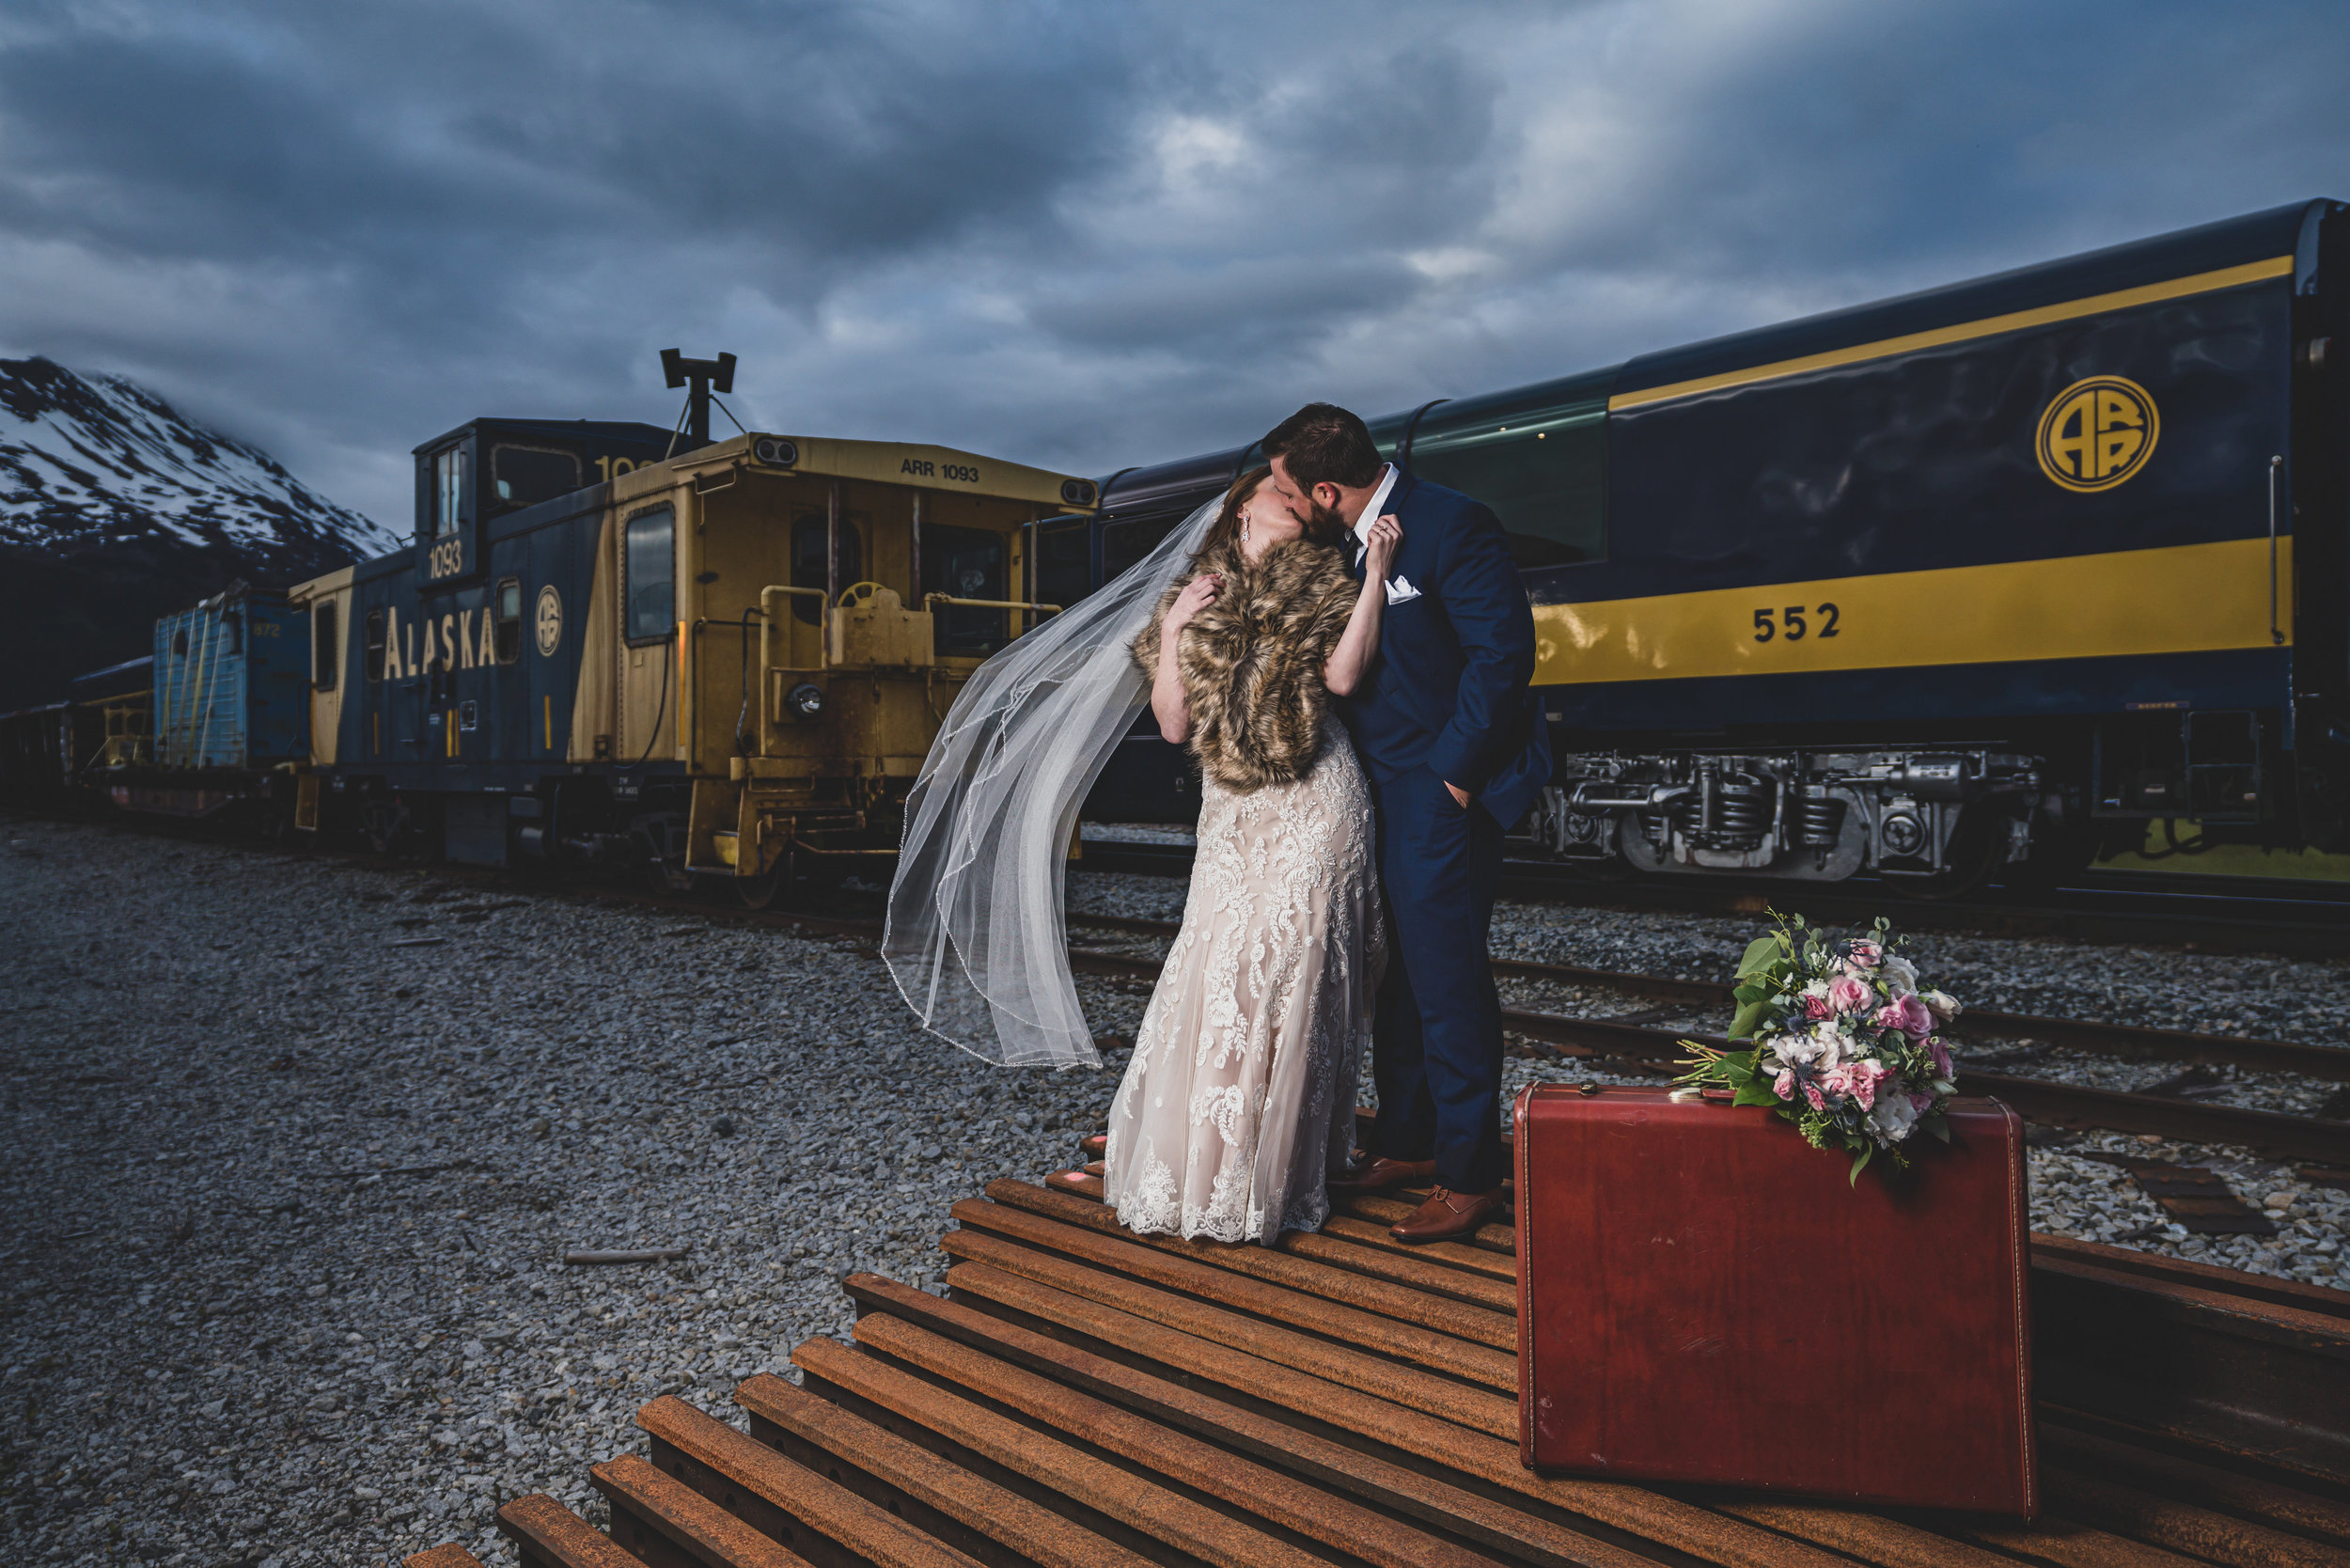 Austin and Kiley Wedding-08 Alaskan Railroad-0024.jpg